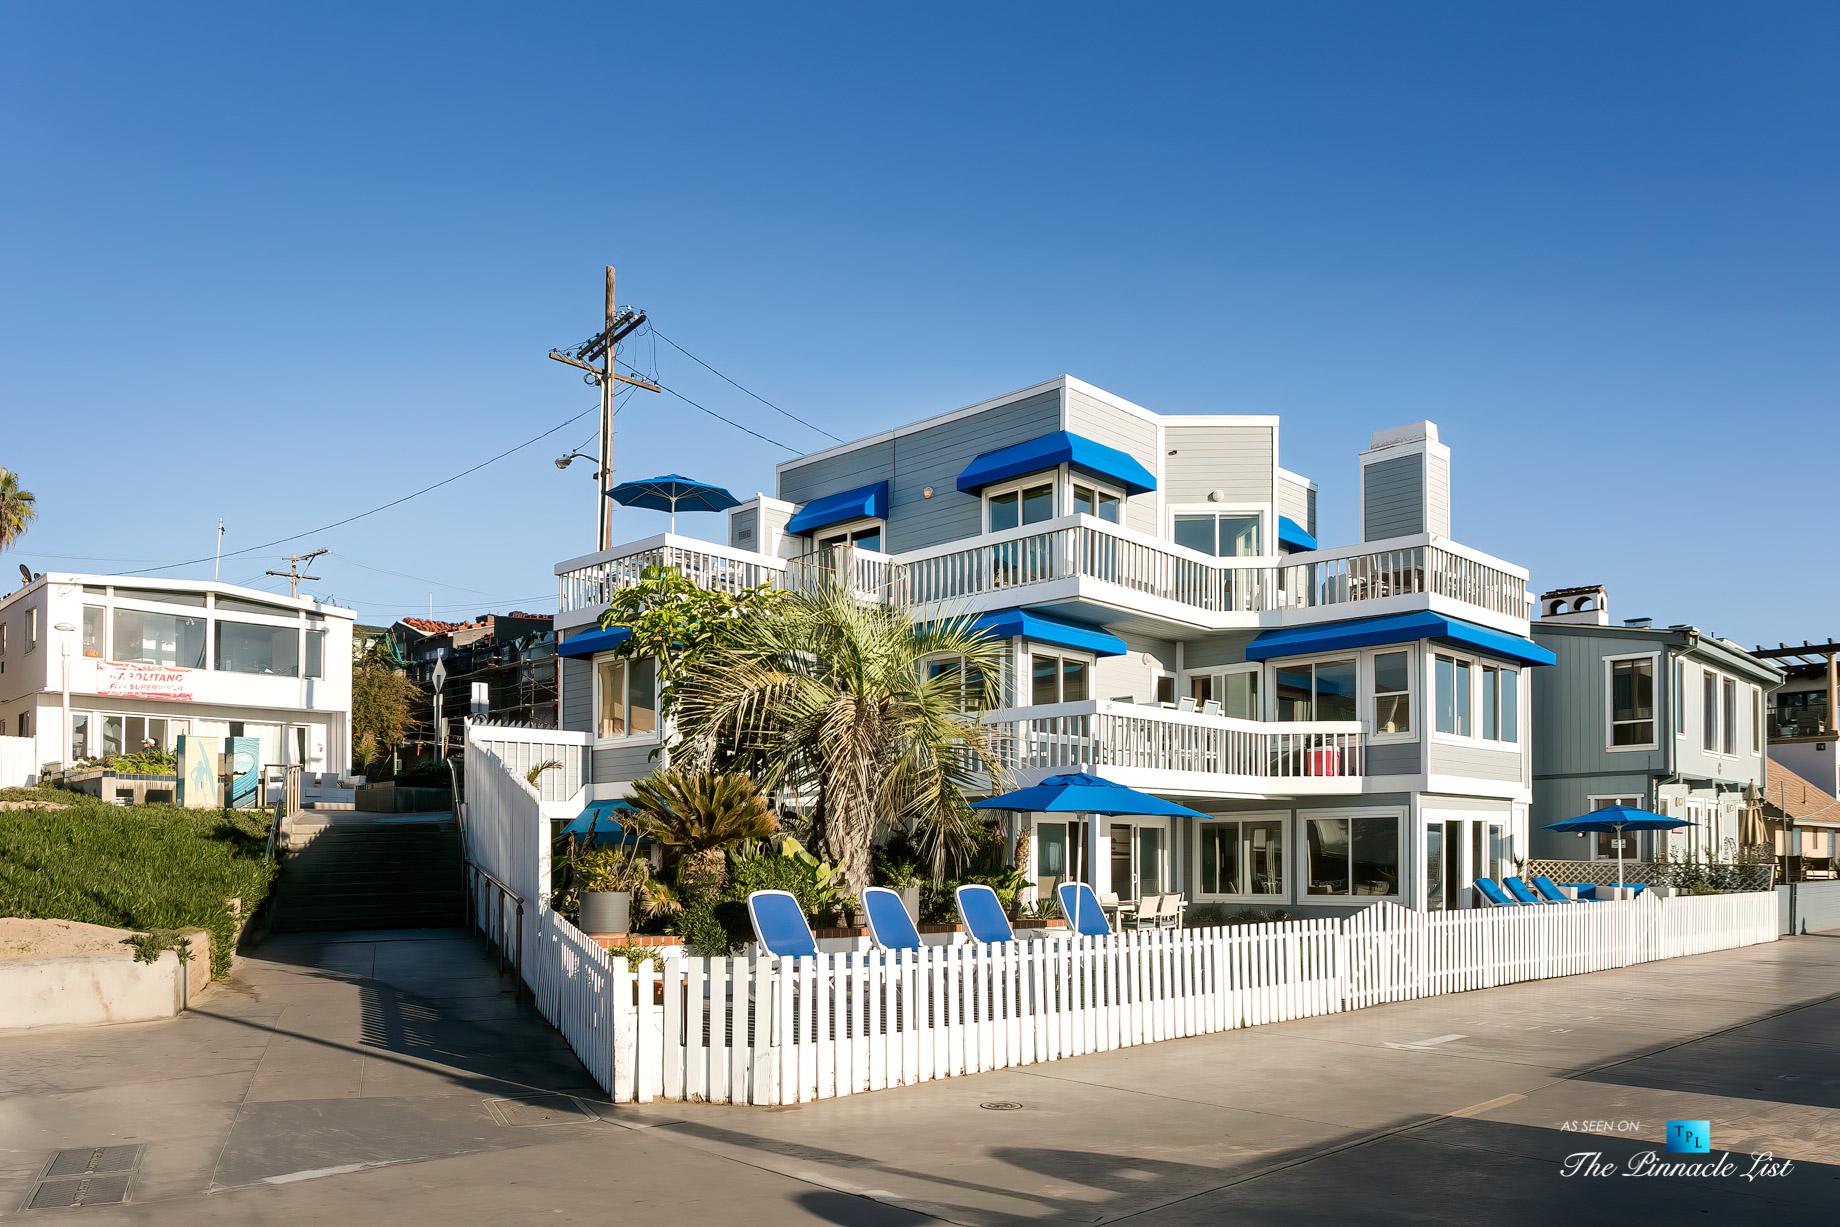 3500 The Strand, Hermosa Beach, CA, USA – Beachfront Decks and Patios – Luxury Real Estate – Original 90210 Beach House – Oceanfront Home